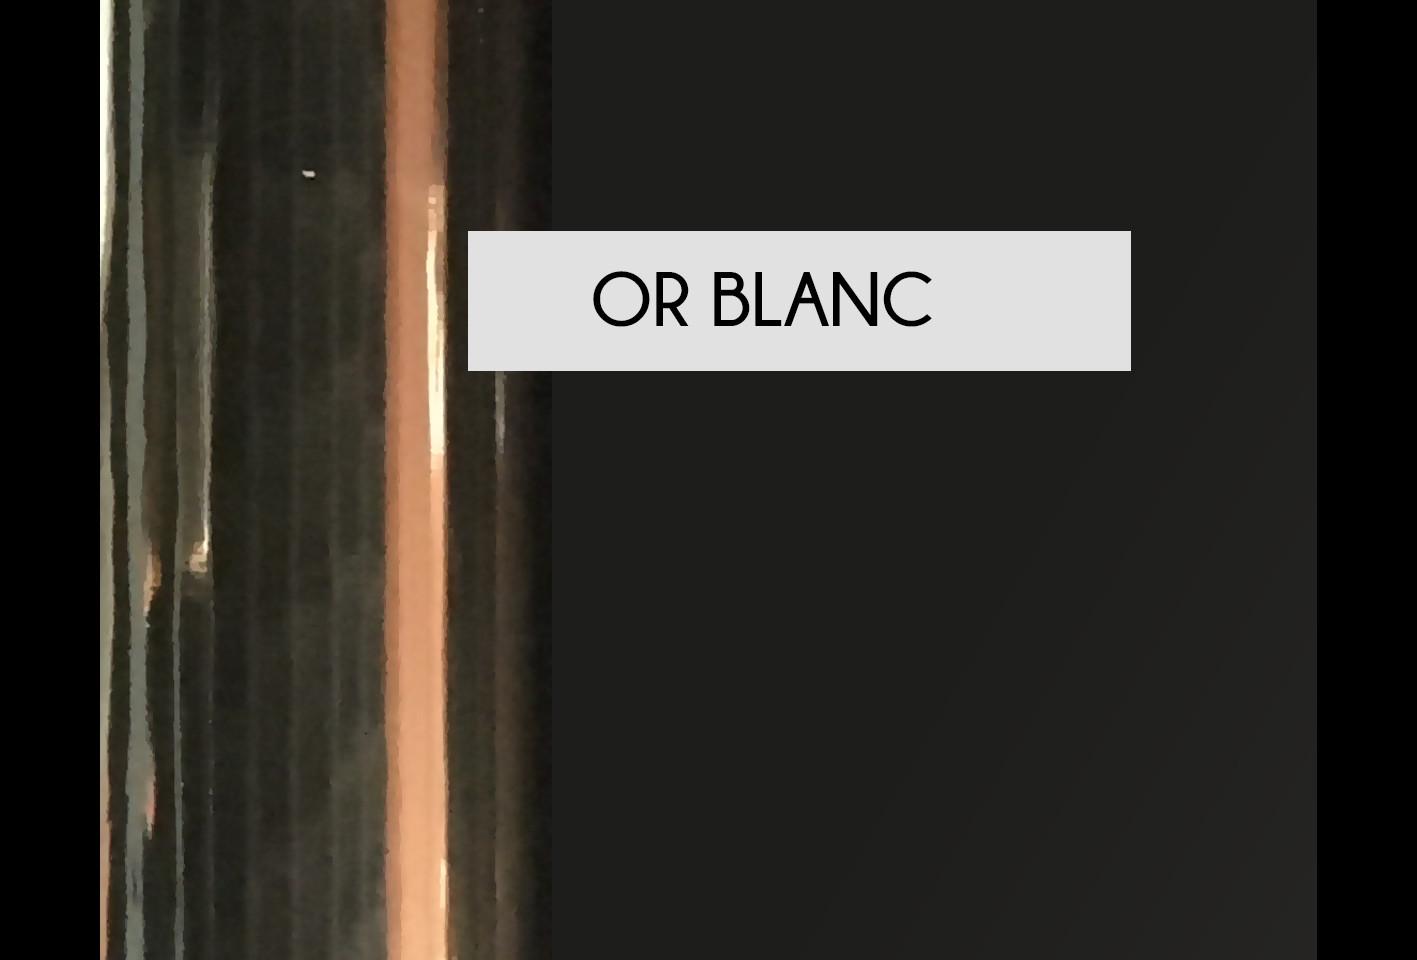 Or-blanc.jpg